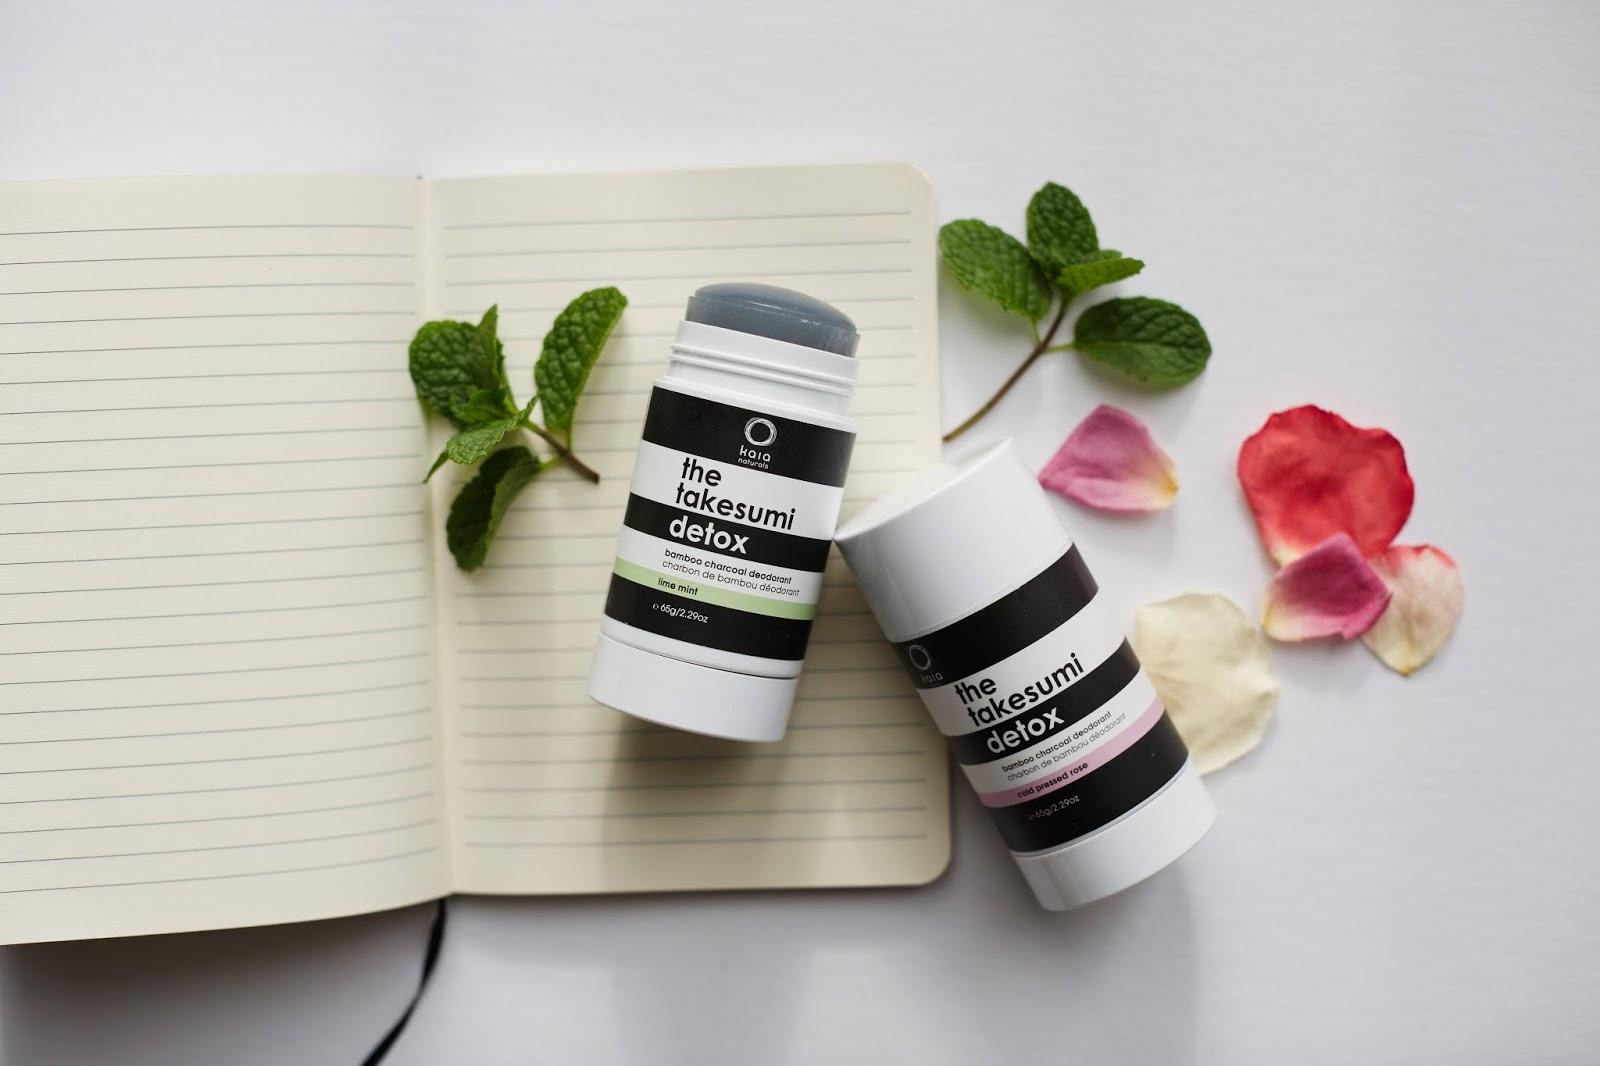 kaia naturals takesumi detox deodorant review